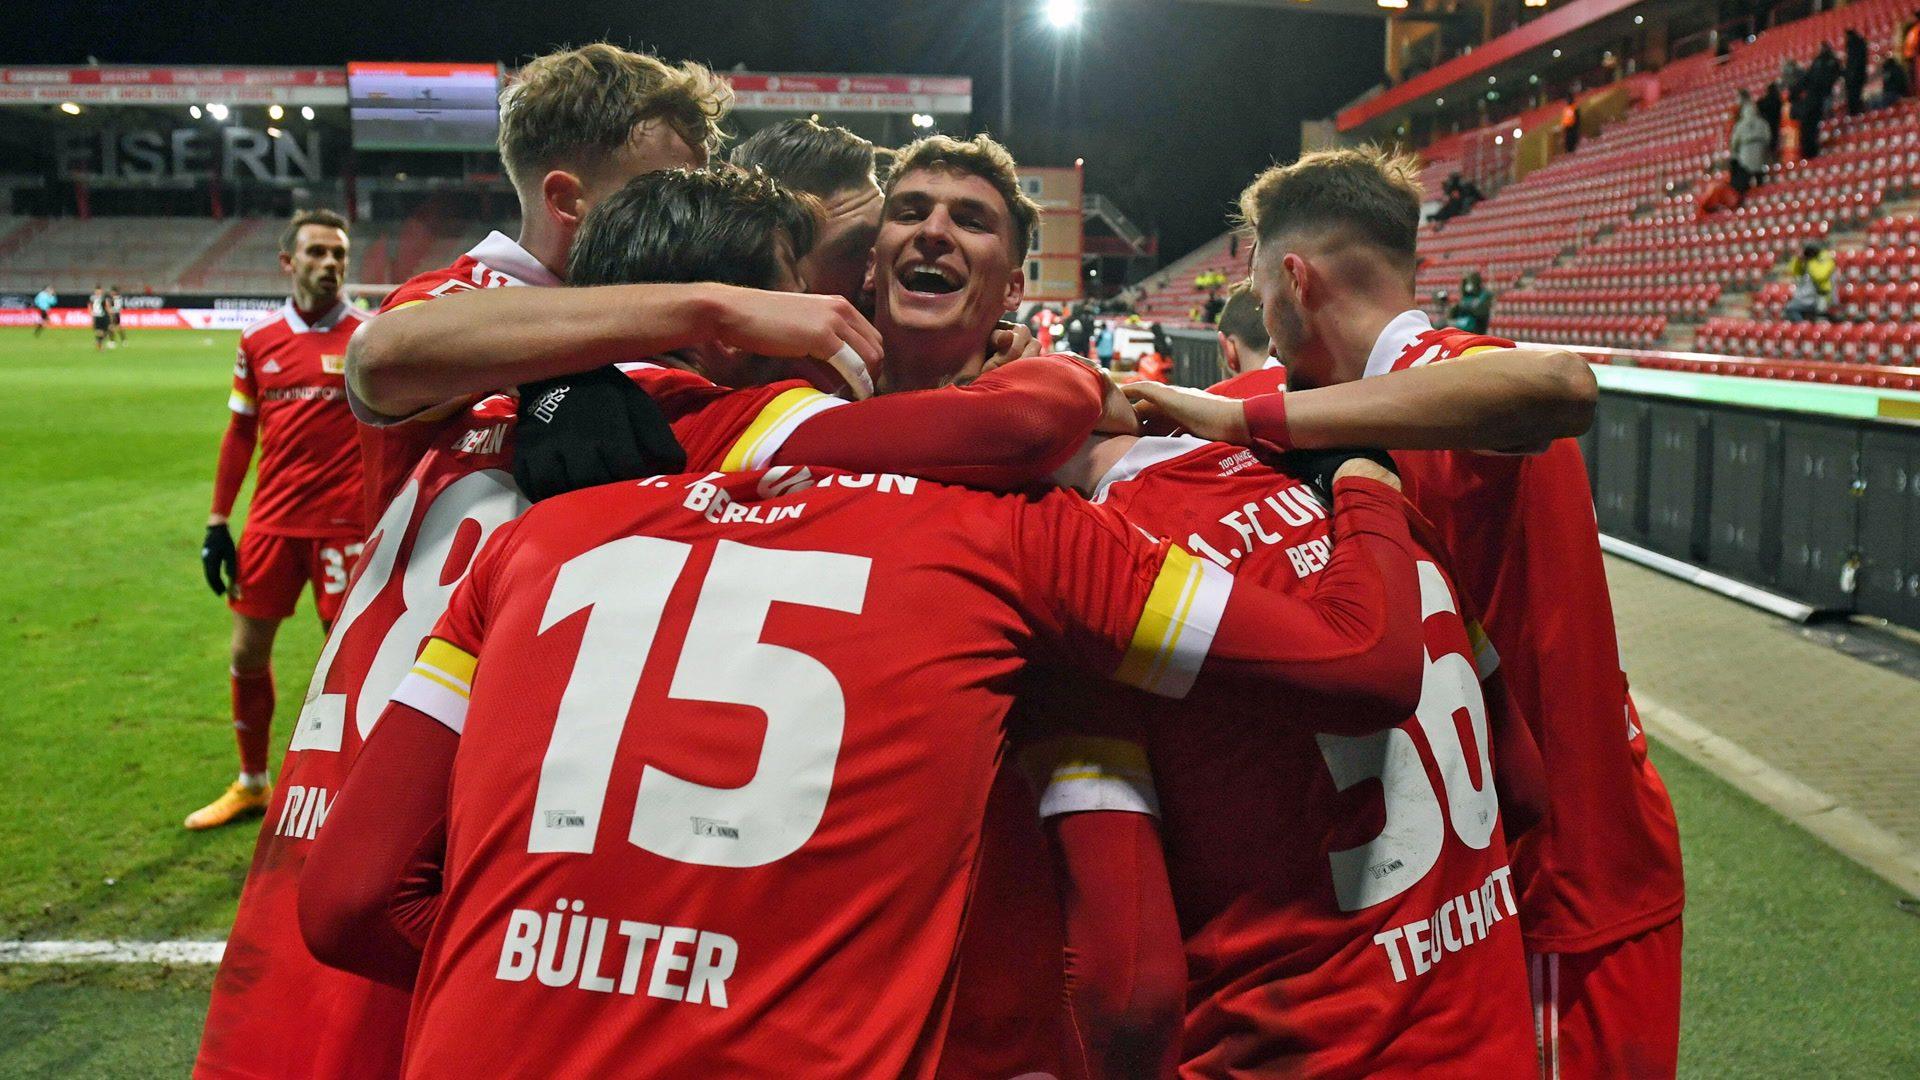 Union leave it late to beat Leverkusen